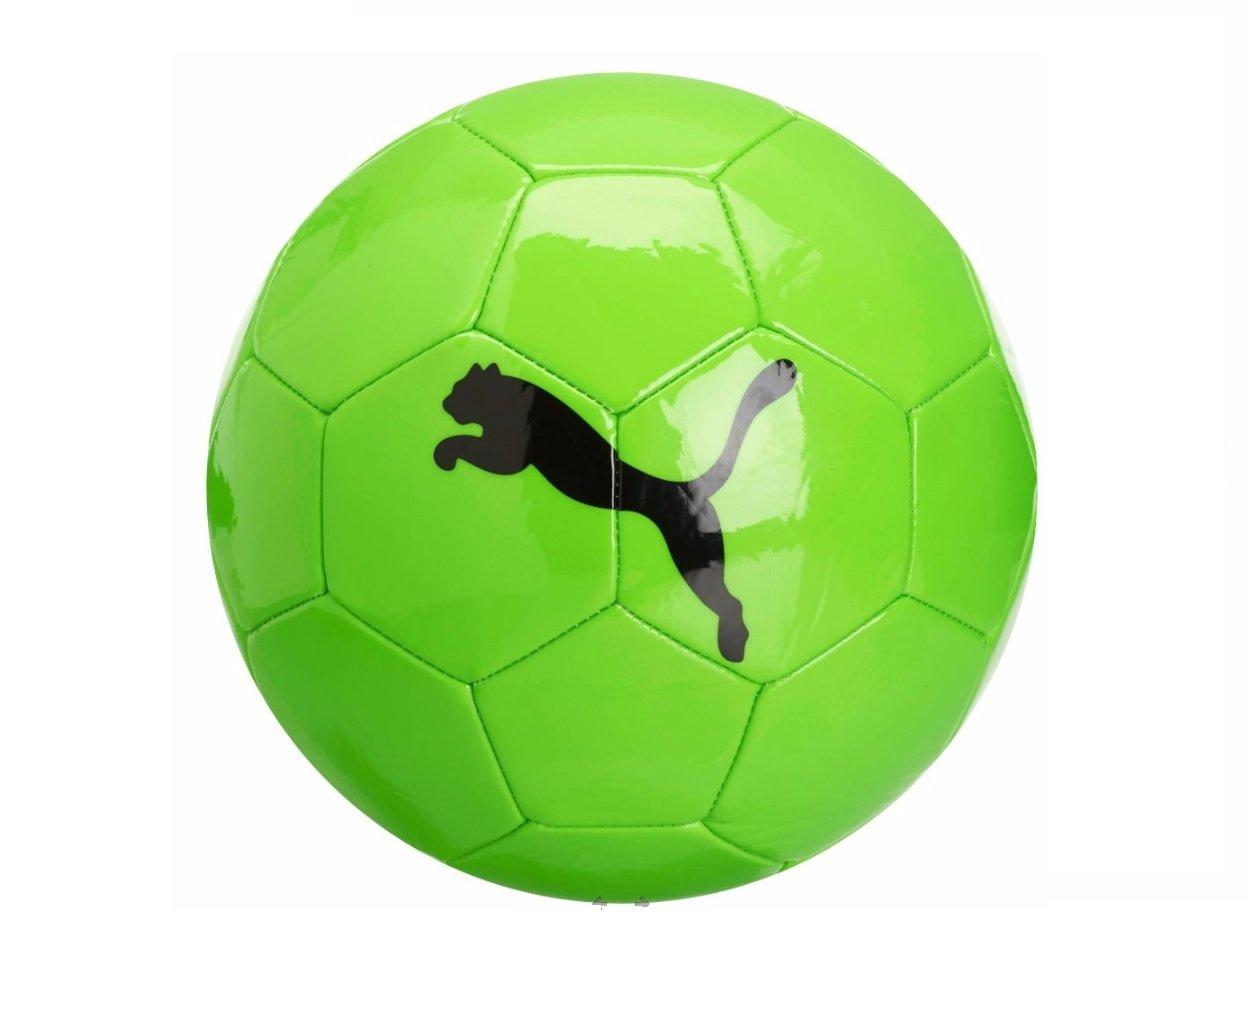 Puma Fluo Catサッカーボール 5 Fluo Green B071ZJGFK4